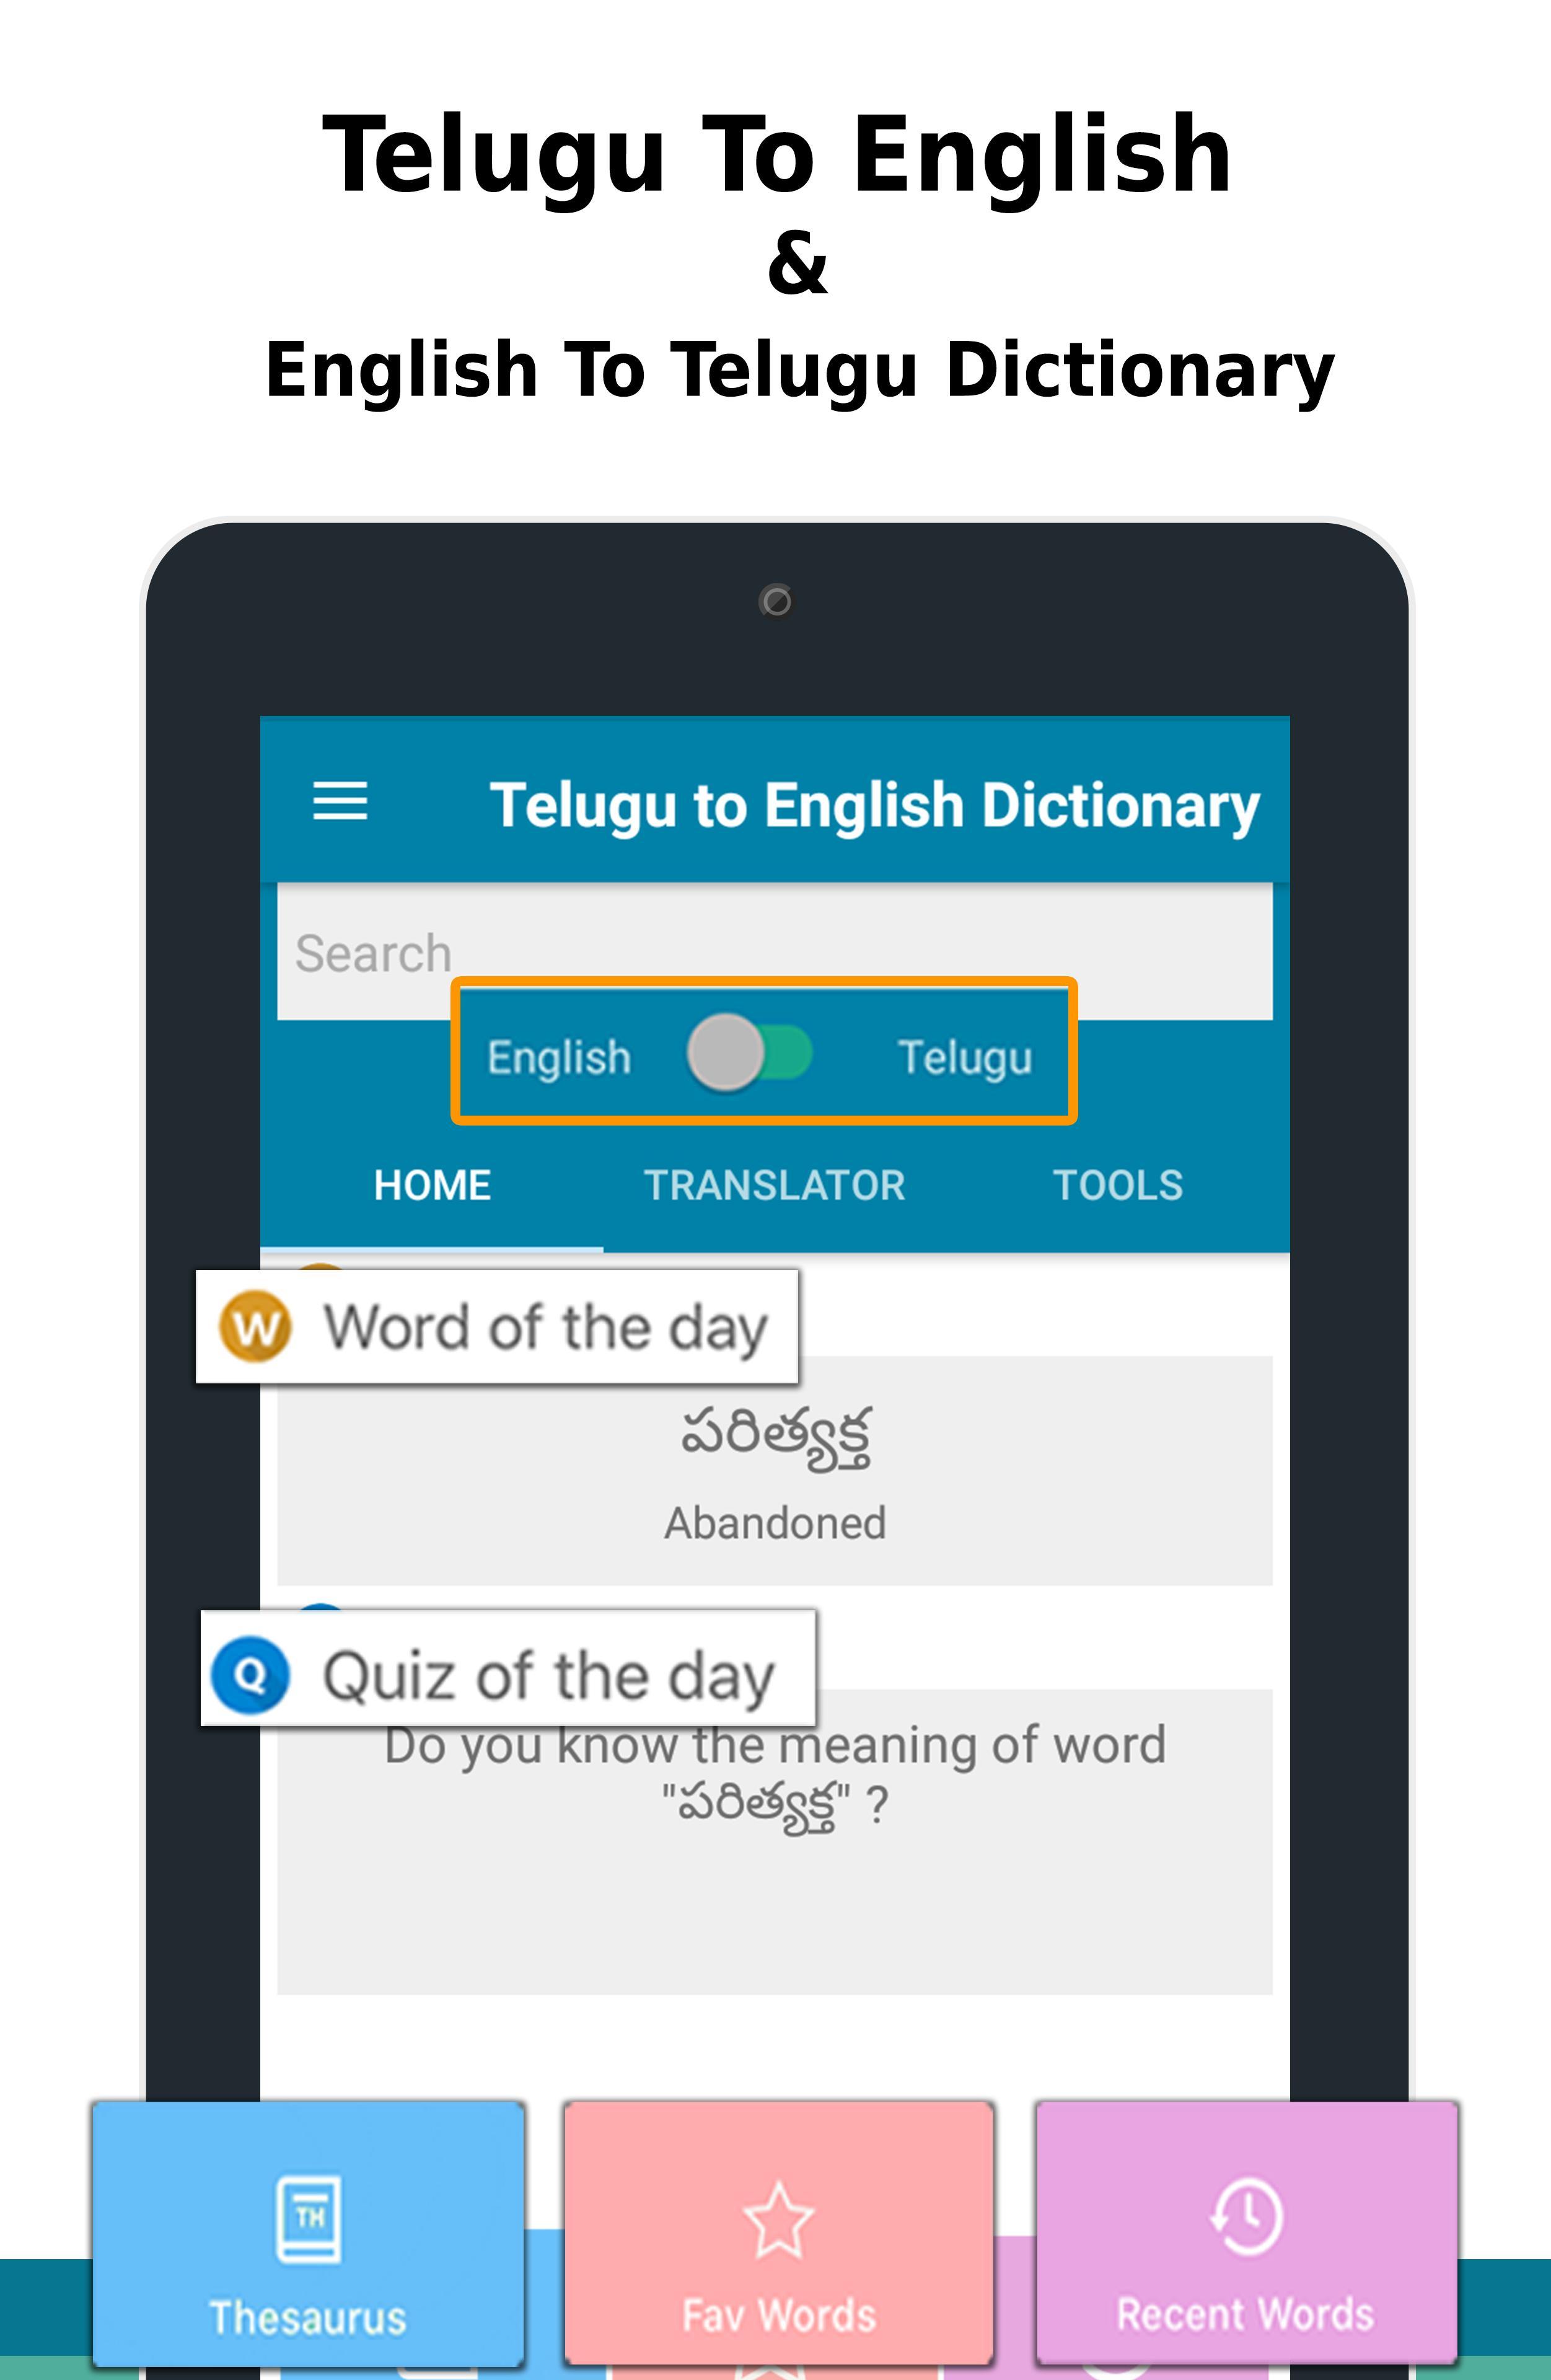 English to Telugu Dictionary & Translator for Android - APK